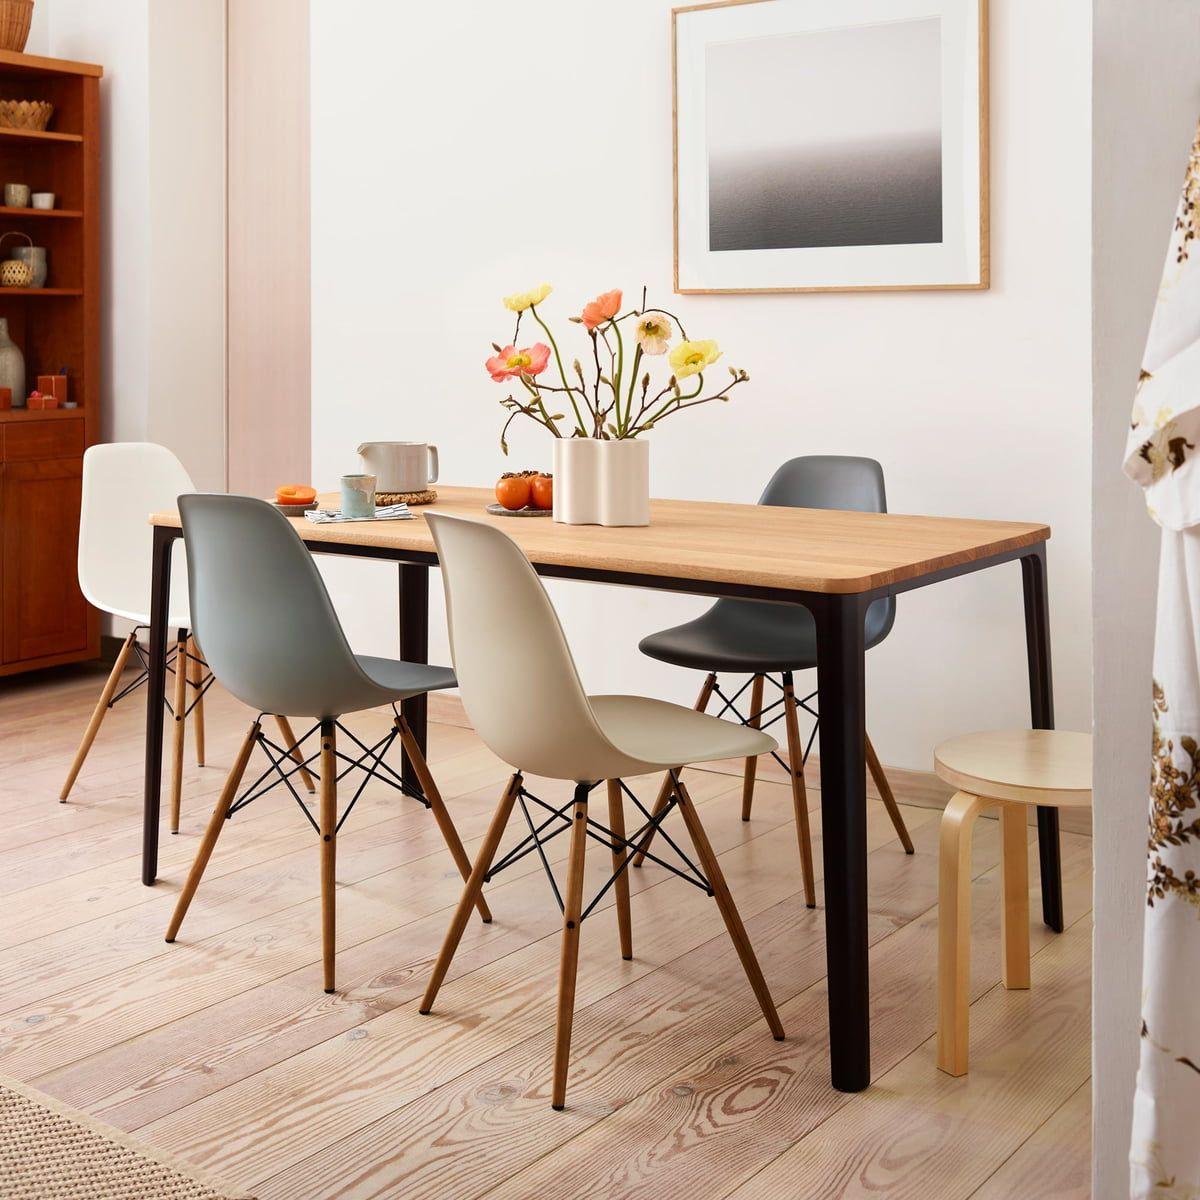 Dsw Stuhl Von Vitra Eames Plastic Side Chair Dsw Connox In 2020 Esszimmer Inspiration Vitra Mobel Eames Design